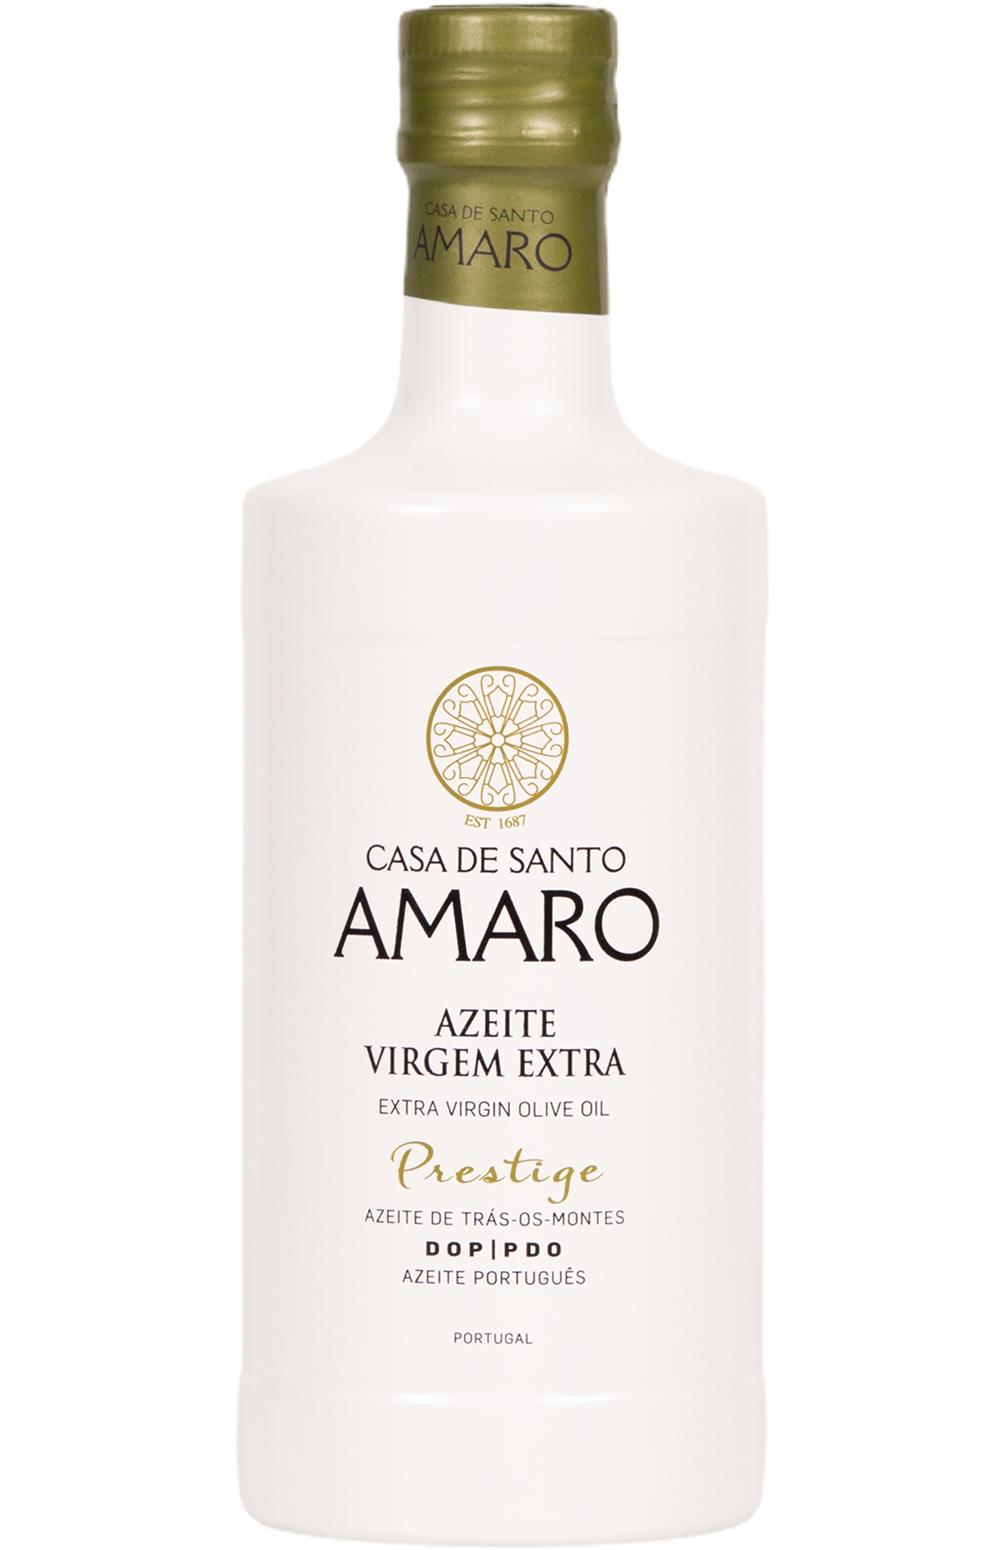 Casa De Santo Amaro Prestige